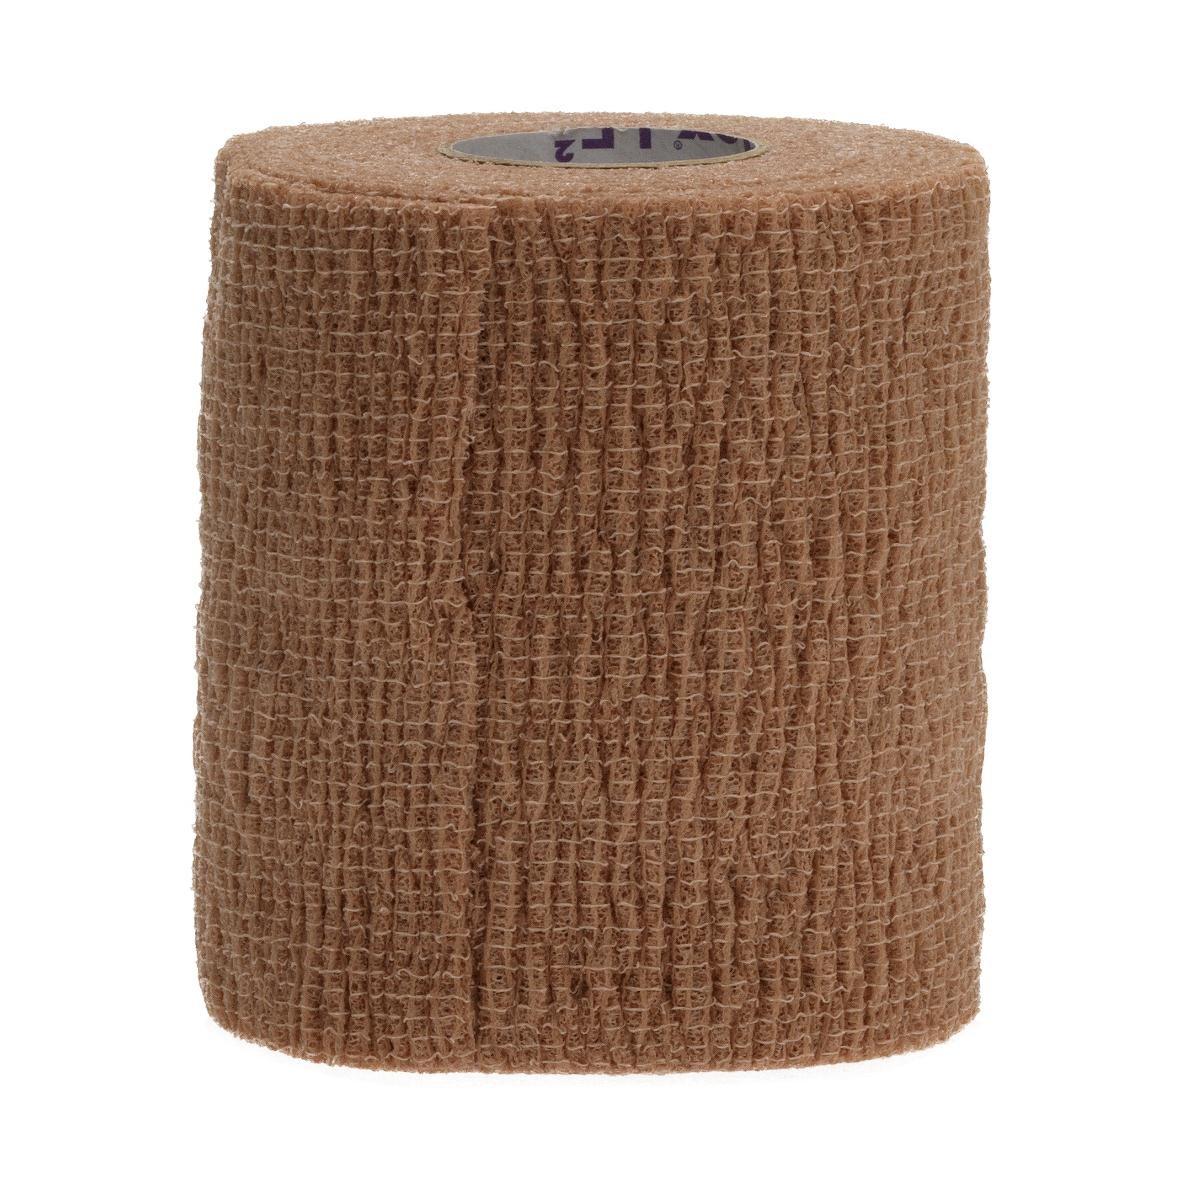 Medline DYNJ089006  Co-Flex LF2 Bandages, Latex Free, Sterile, 6'' x 5 yard, Tan (Pack of 20)